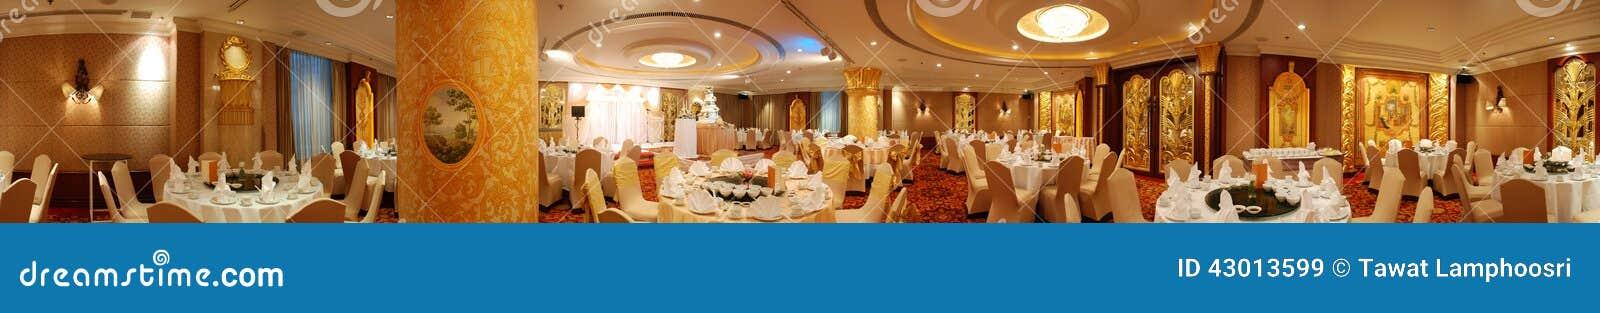 Hotel dining room panorama stock photo image